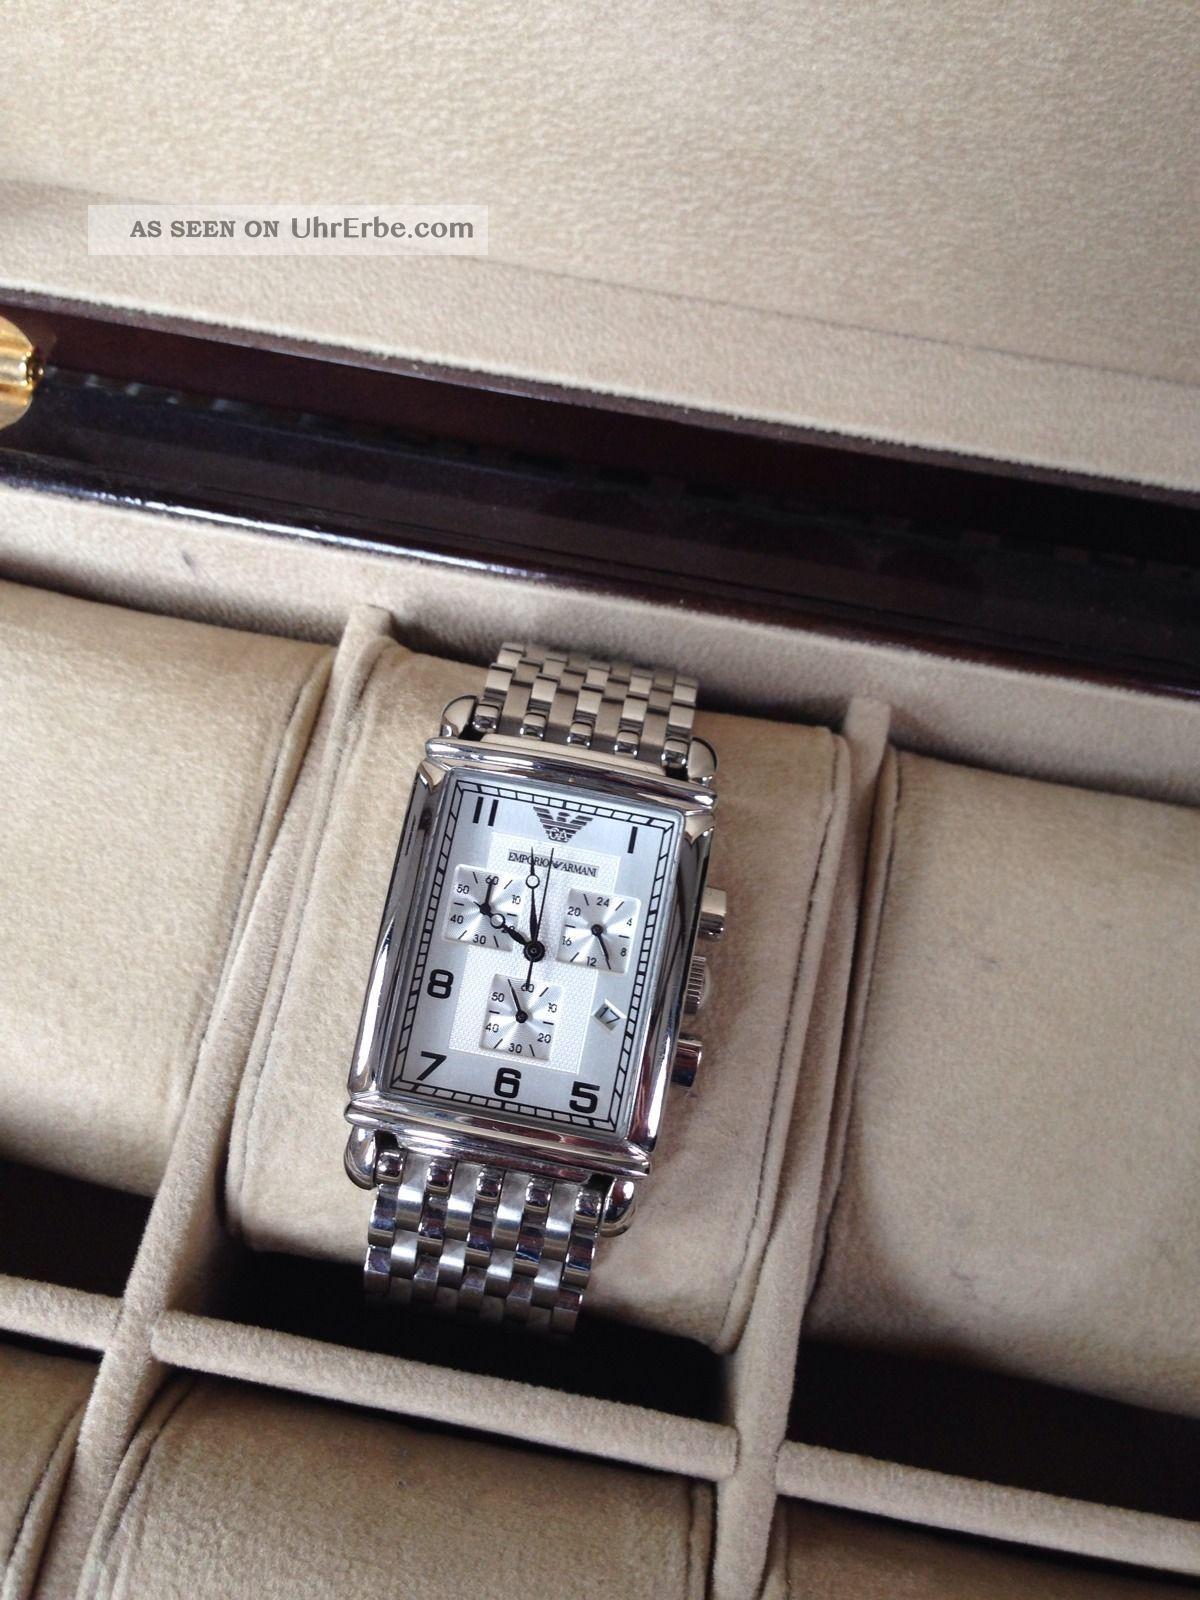 Armani Armbanduhr Armbanduhren Bild